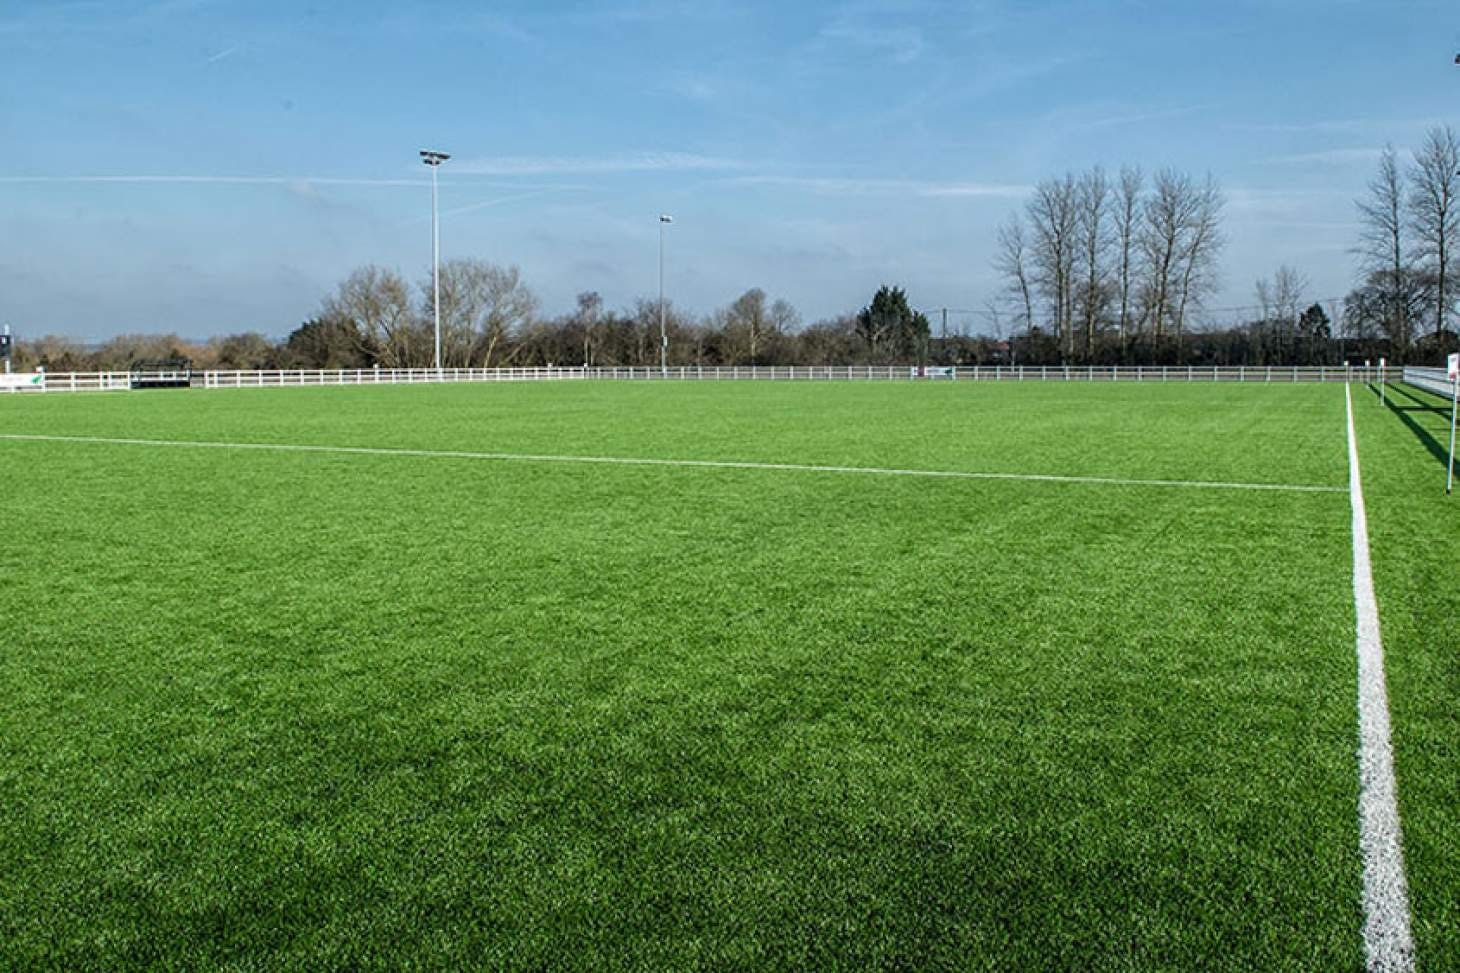 PlayFootball Derby 8 a side | 3G Astroturf football pitch